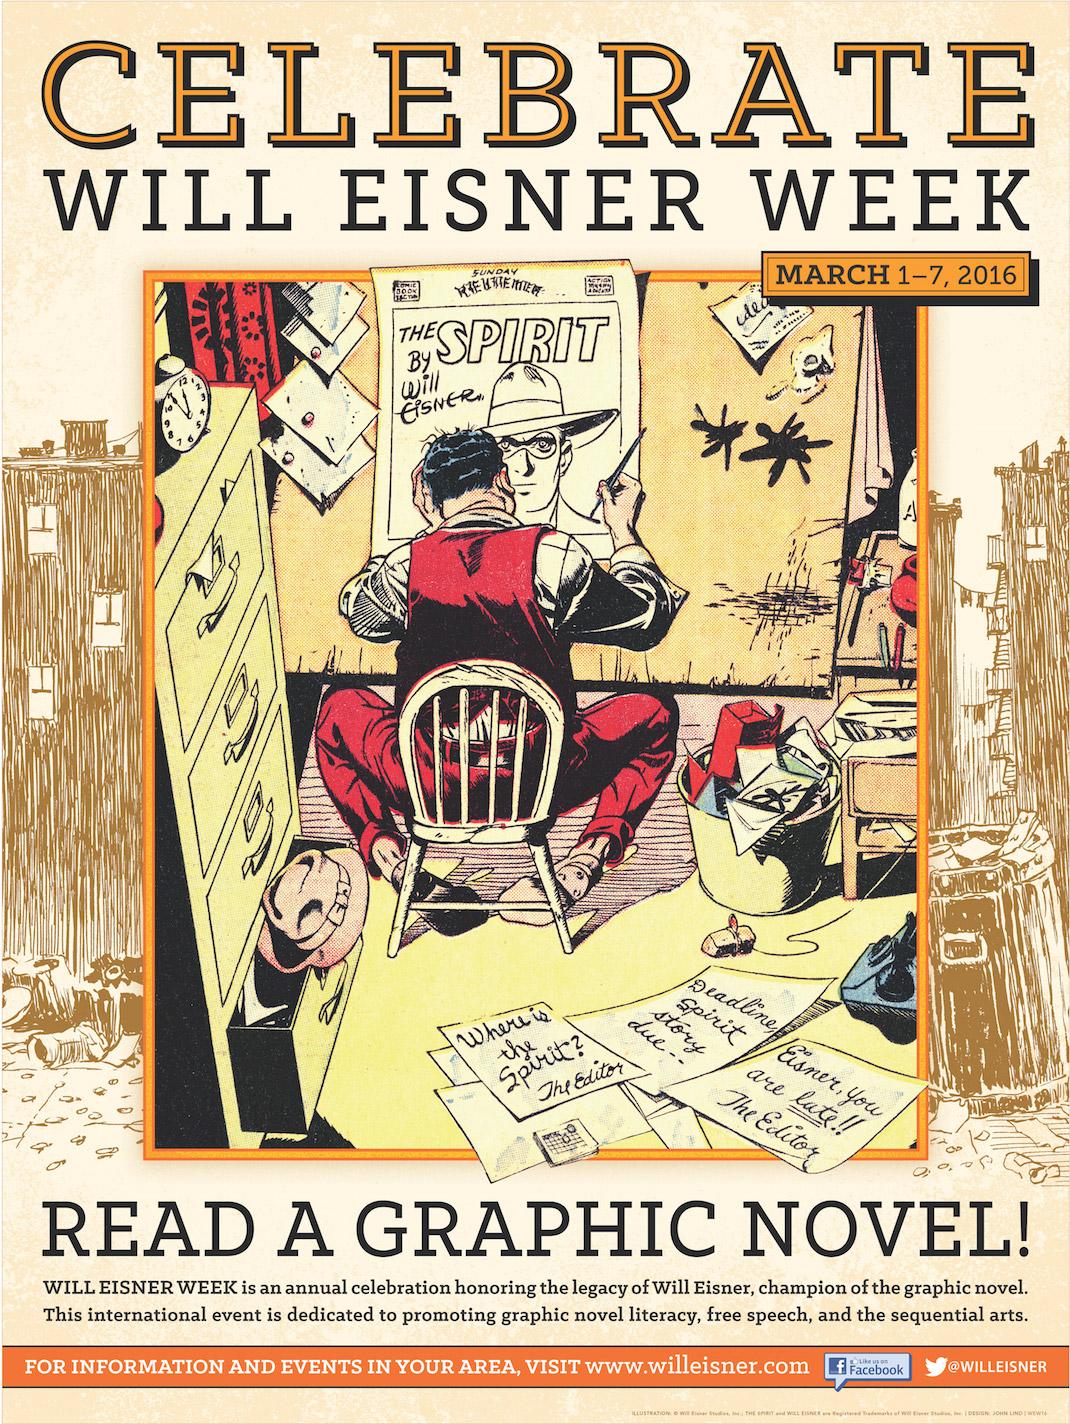 http://www.willeisner.com/the_eisnershpritz/WESI_WEW2016_Poster_96dpi.jpg